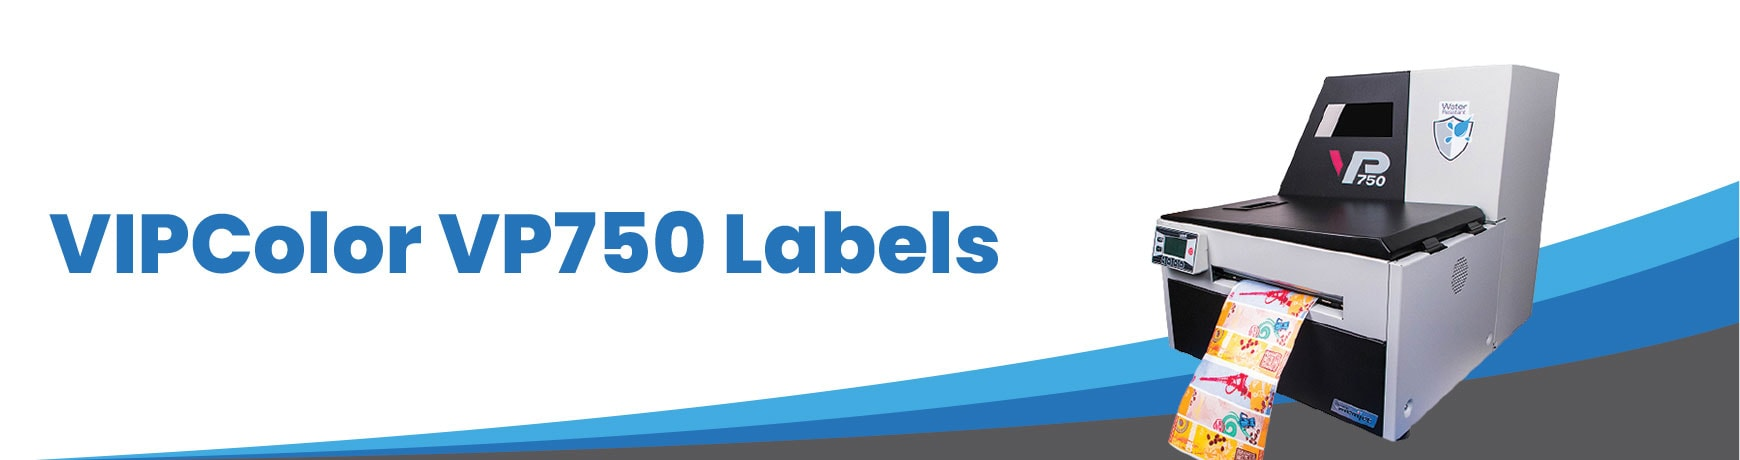 VIPColor VP750 Labels